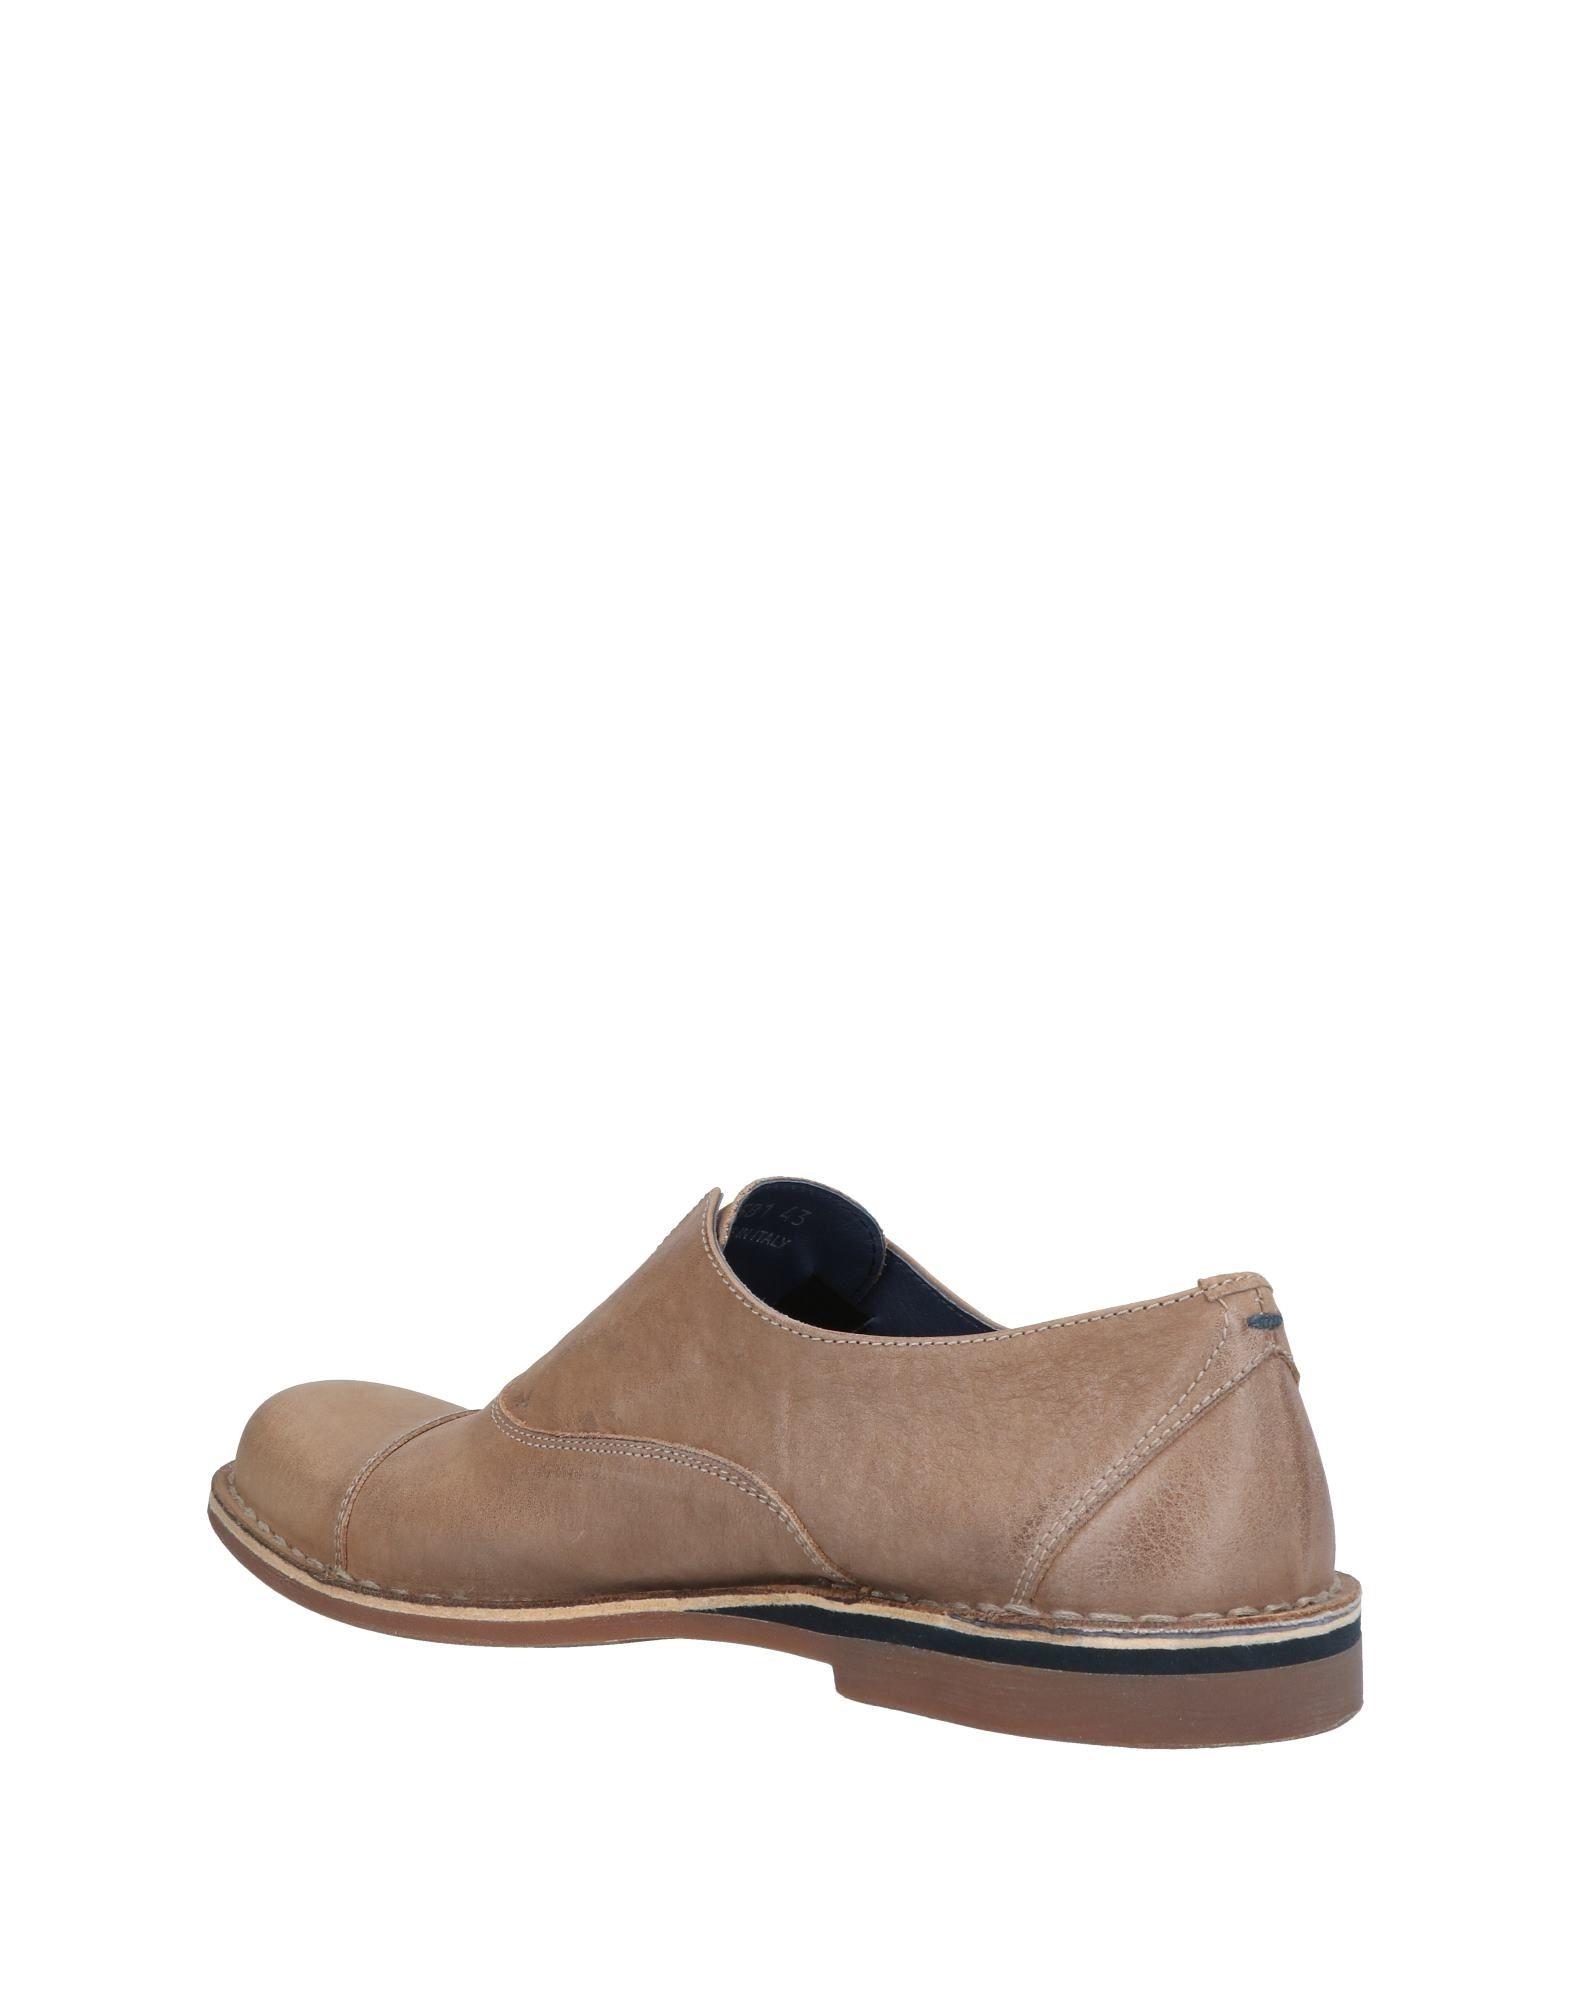 Rabatt echte  Schuhe Kebo Mokassins Herren  echte 11131999ML 23d820